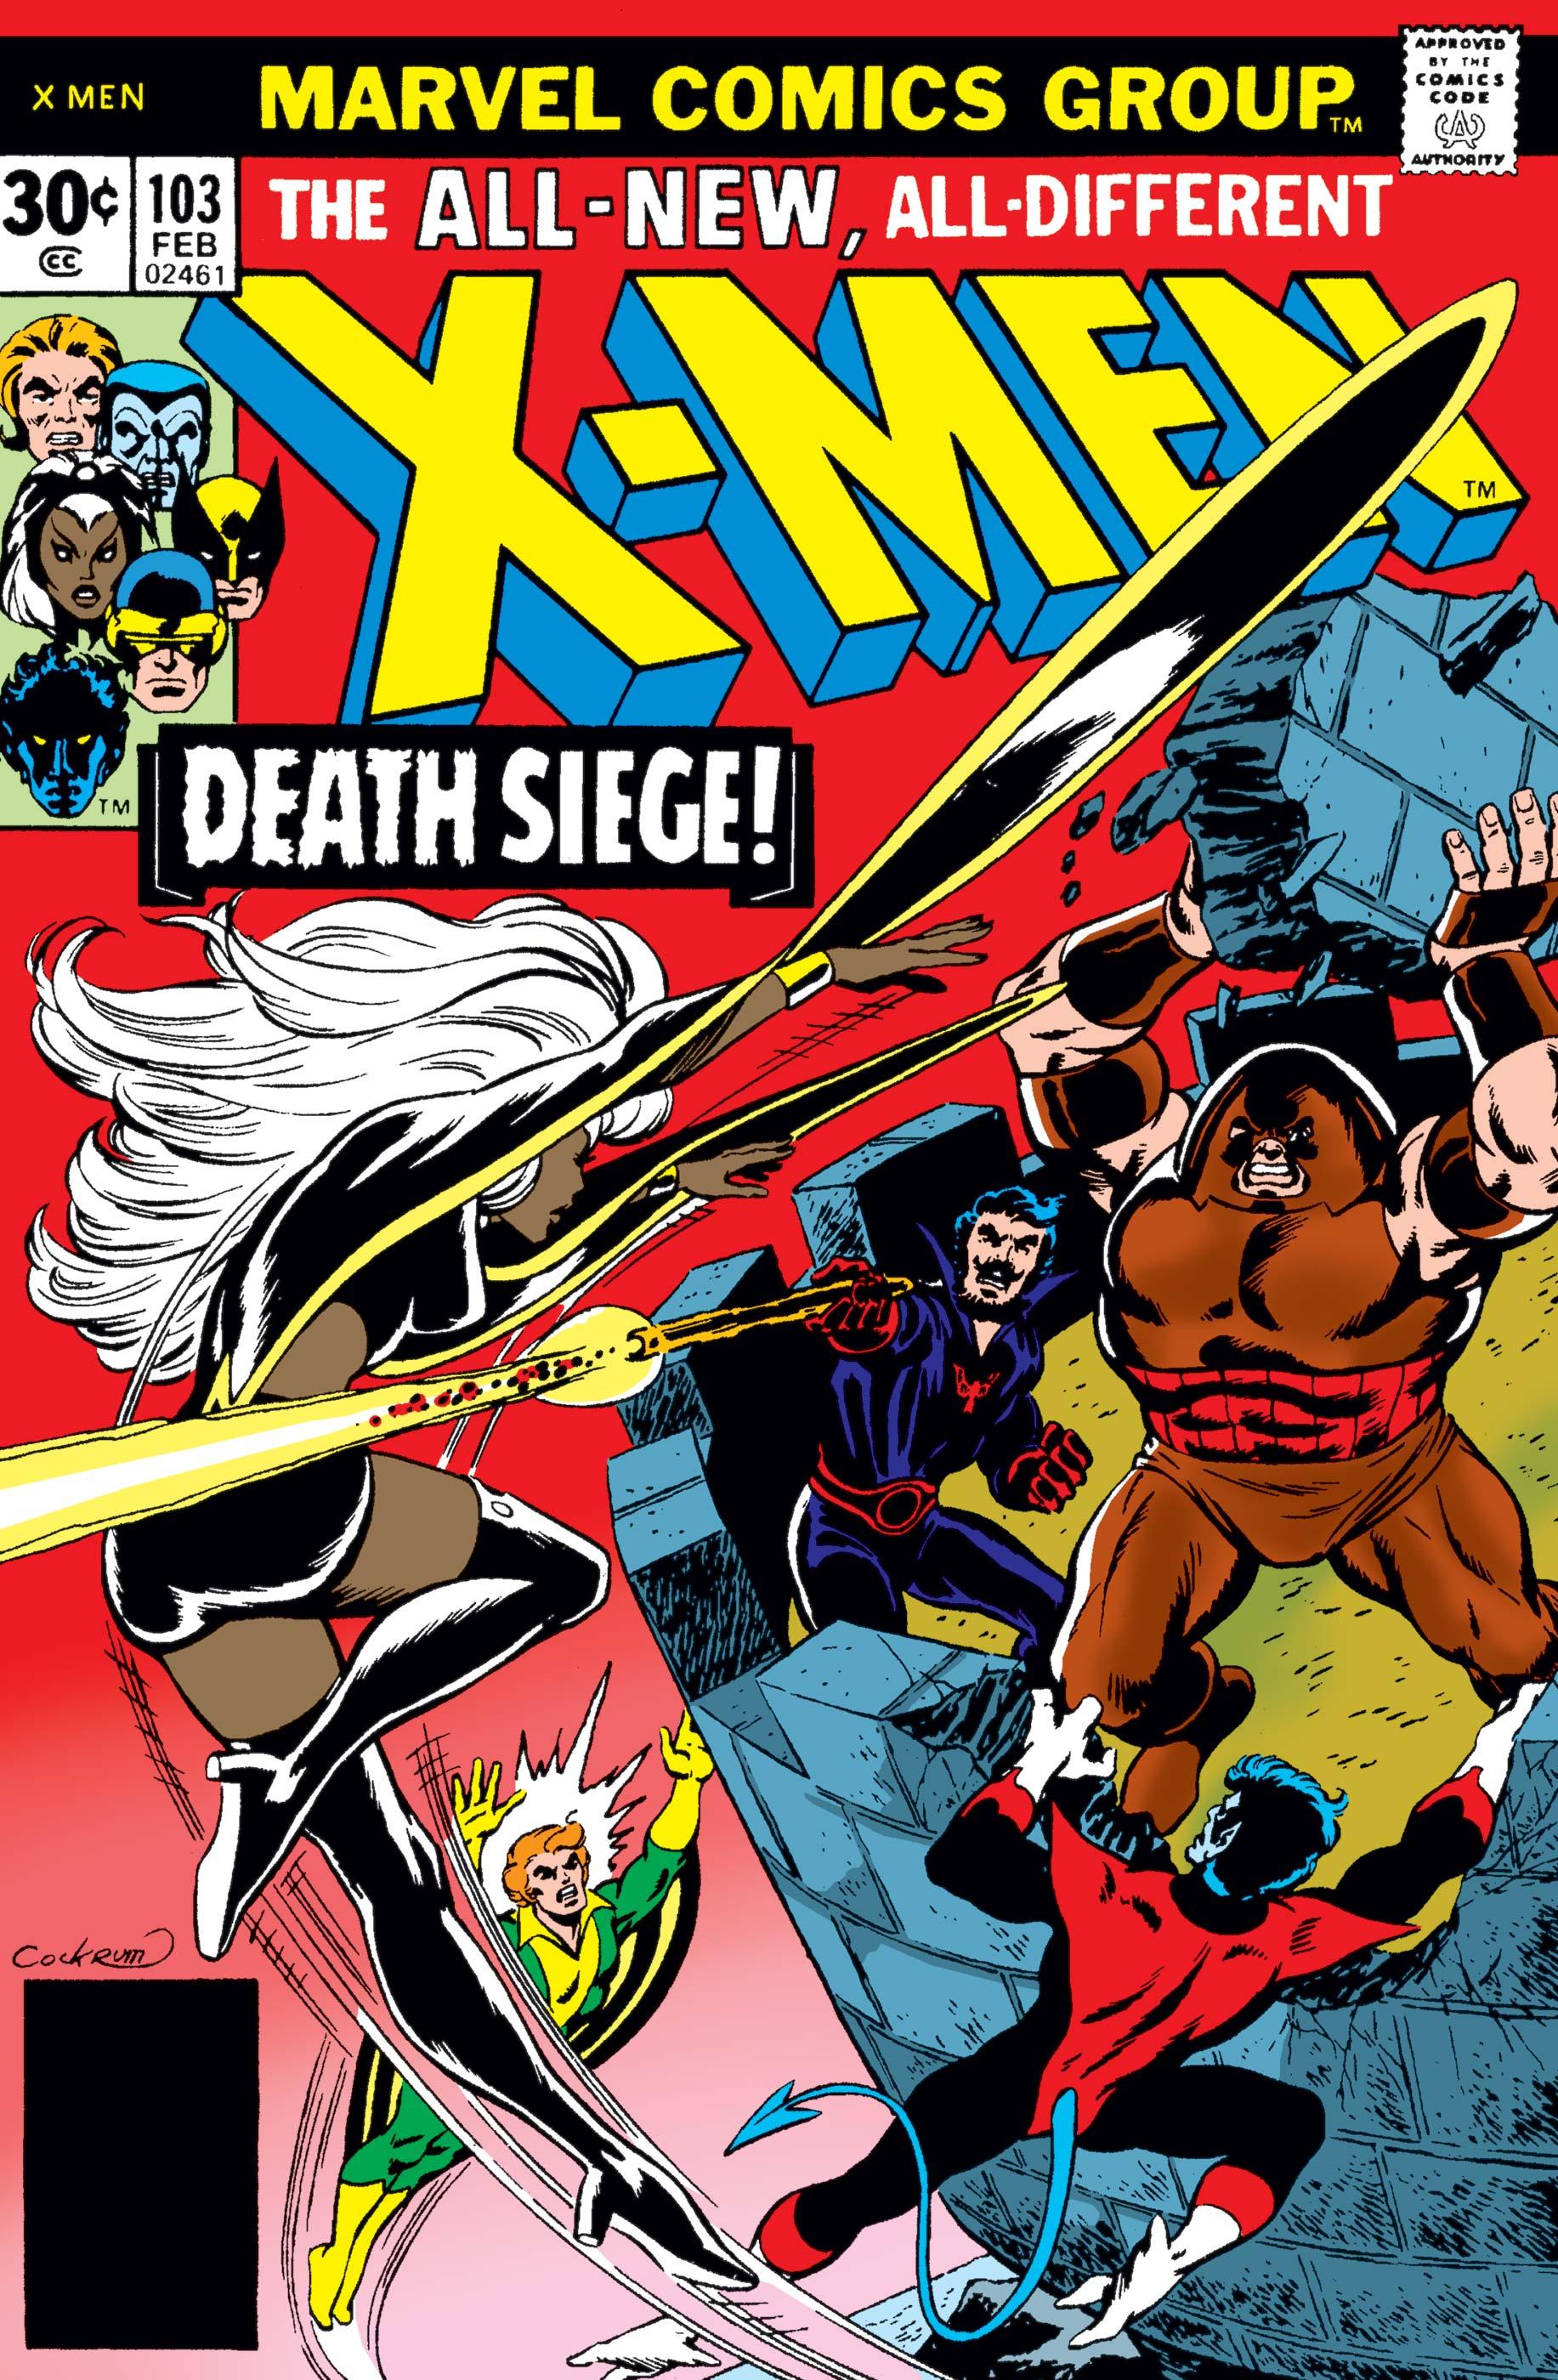 Uncanny X-Men (1963) #103